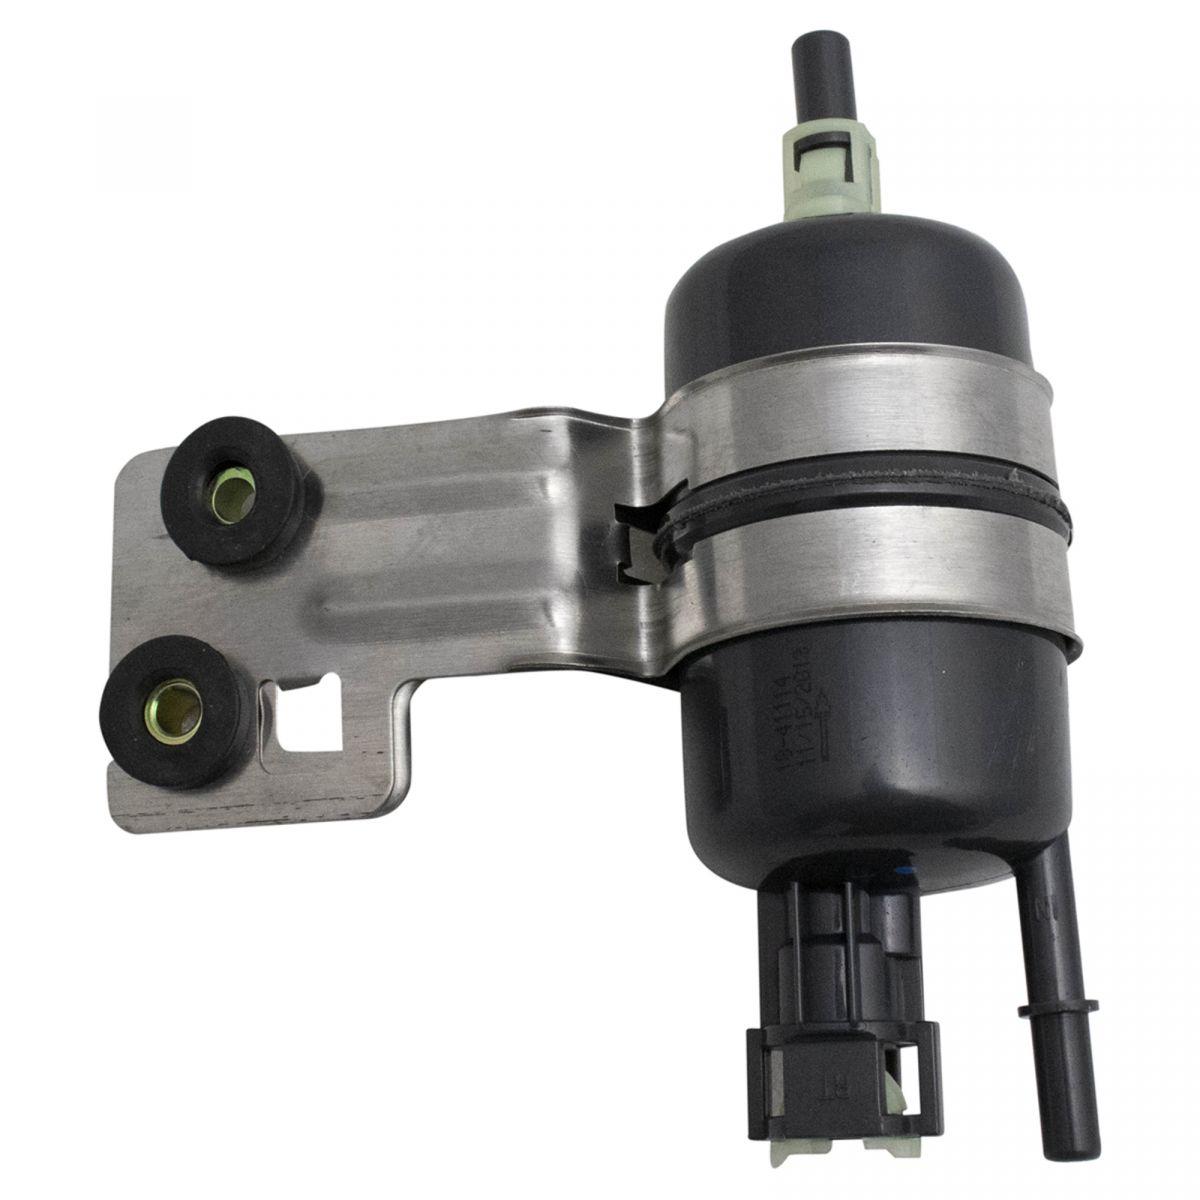 OEM 68193495AA Fuel Filter & Regulator Assembly for 02-04 Jeep Grand  Cherokee | eBayeBay